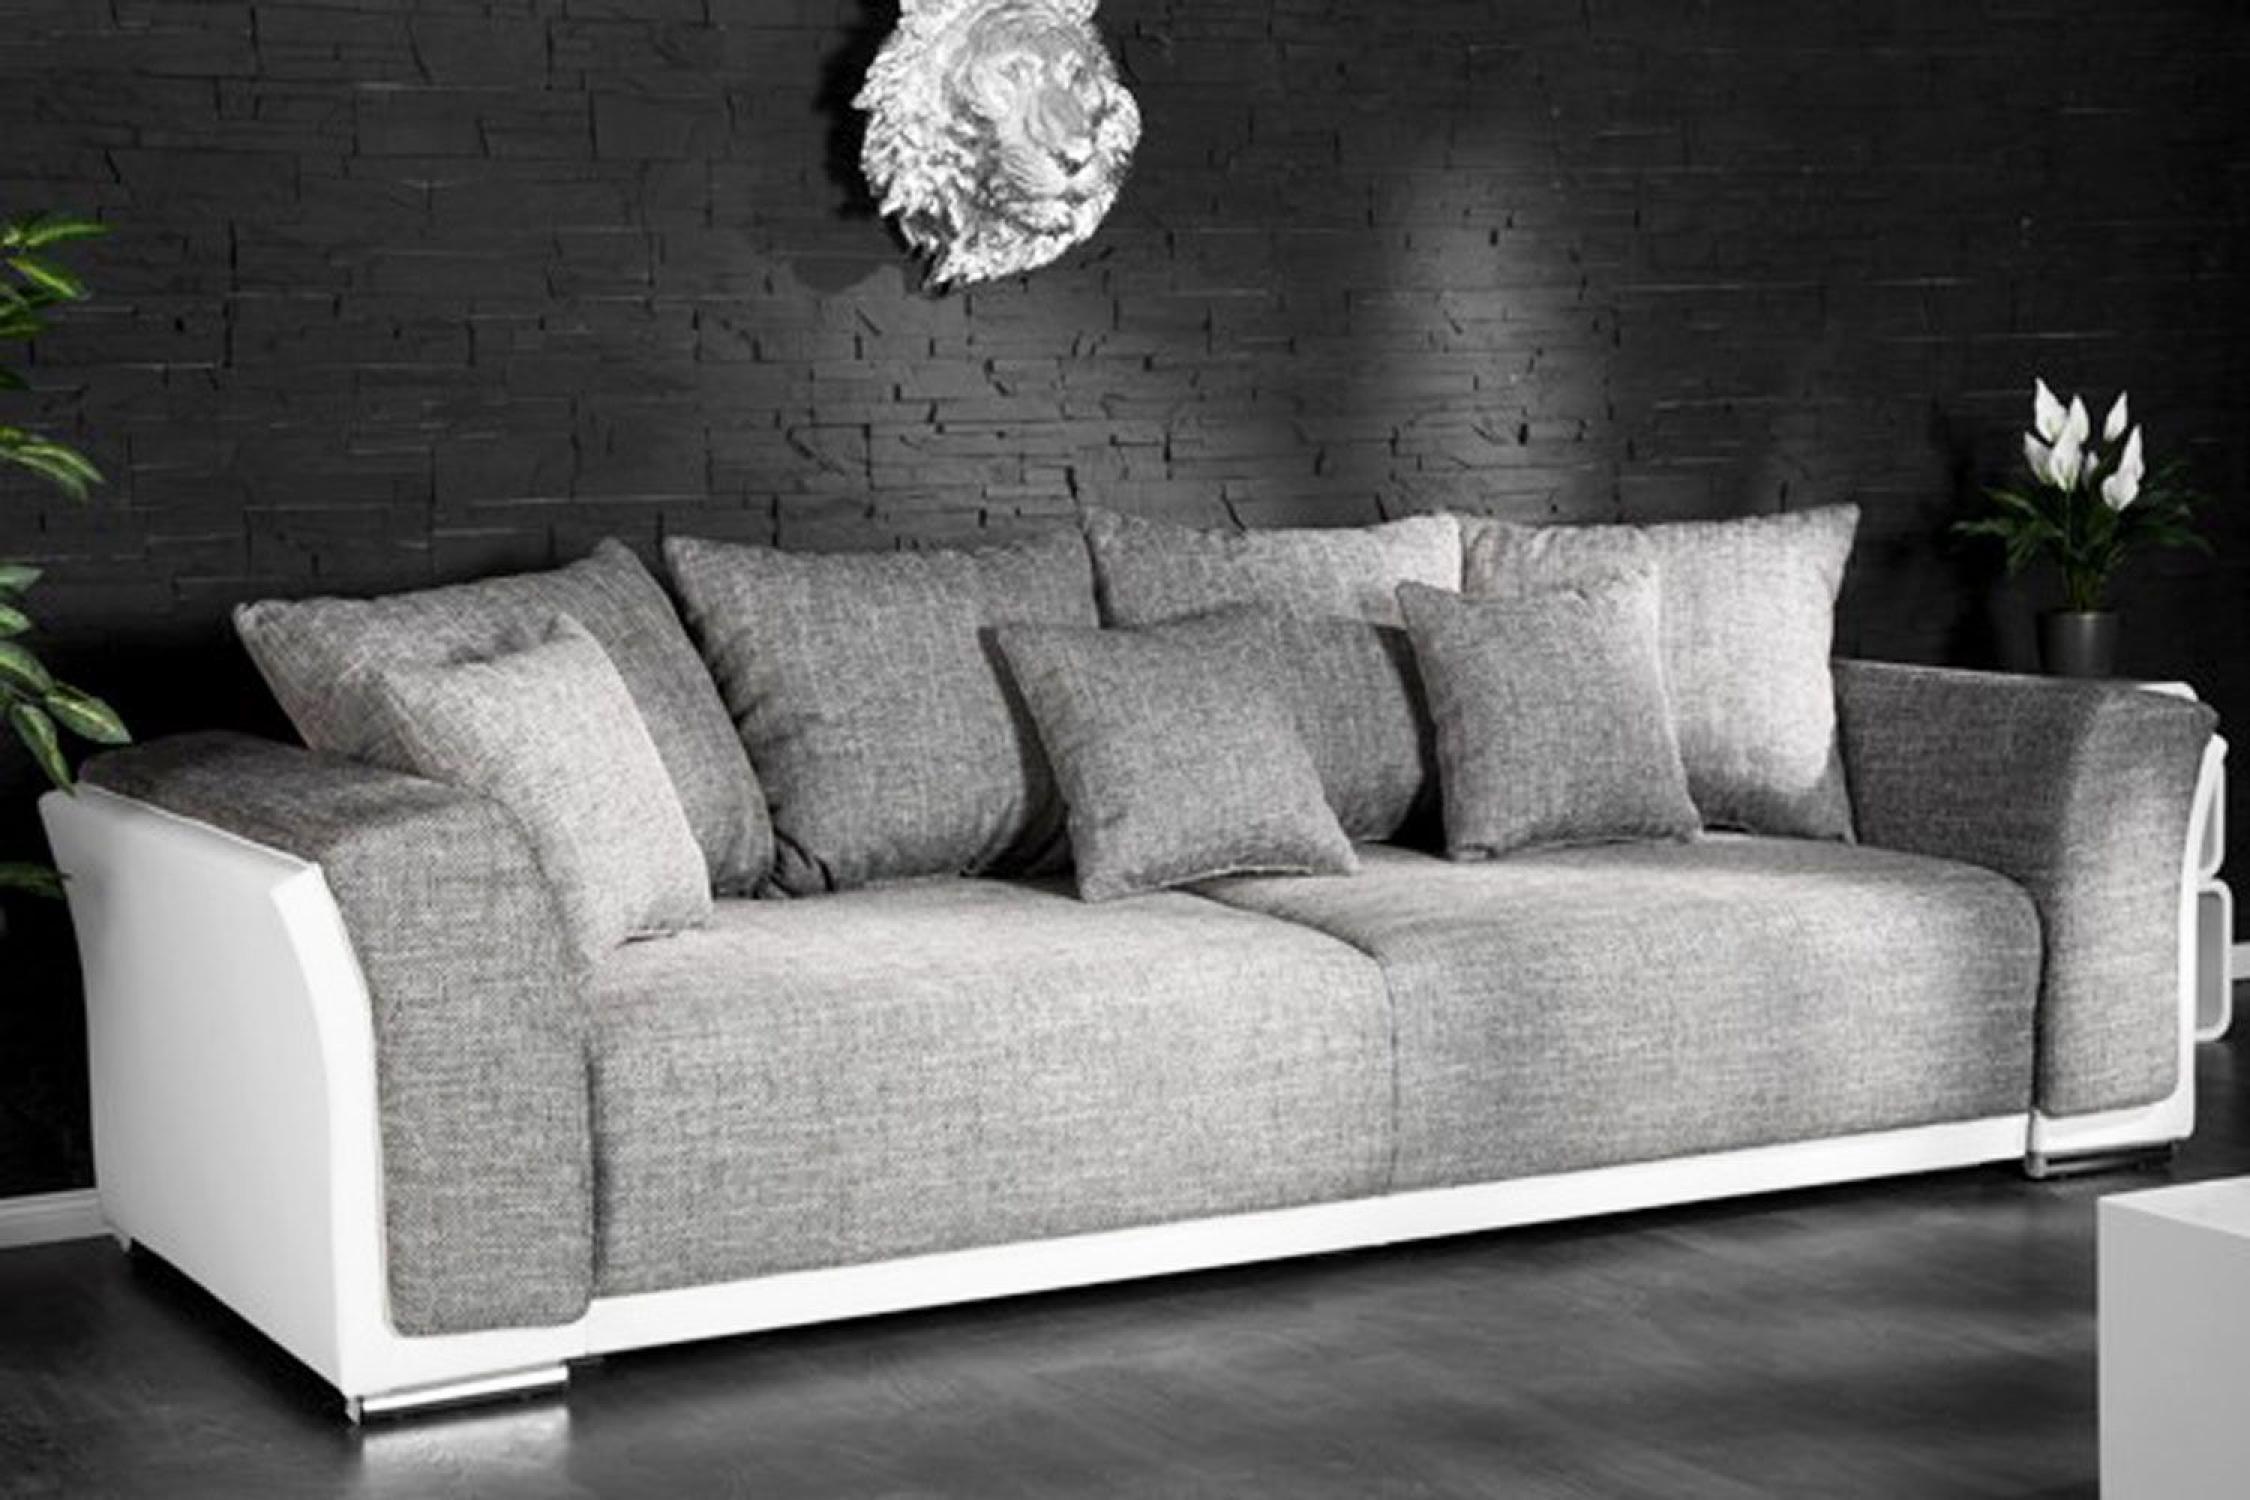 david Author at Royal Sofa idée de canapé et meuble maison